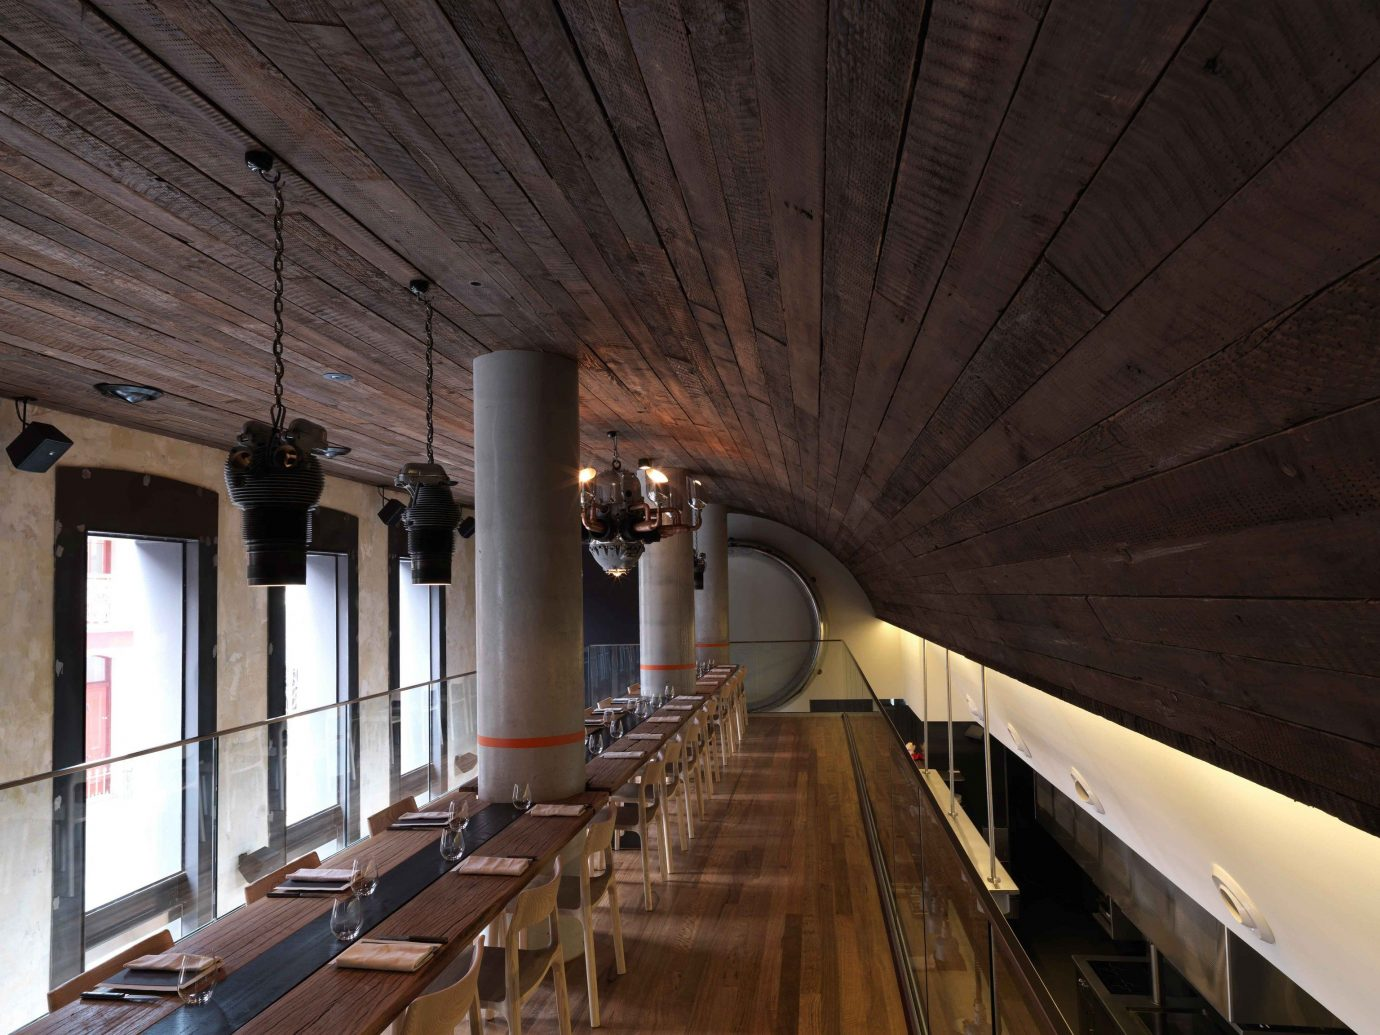 Food + Drink indoor building room Architecture ceiling wood interior design lighting estate platform hall tourist attraction subway